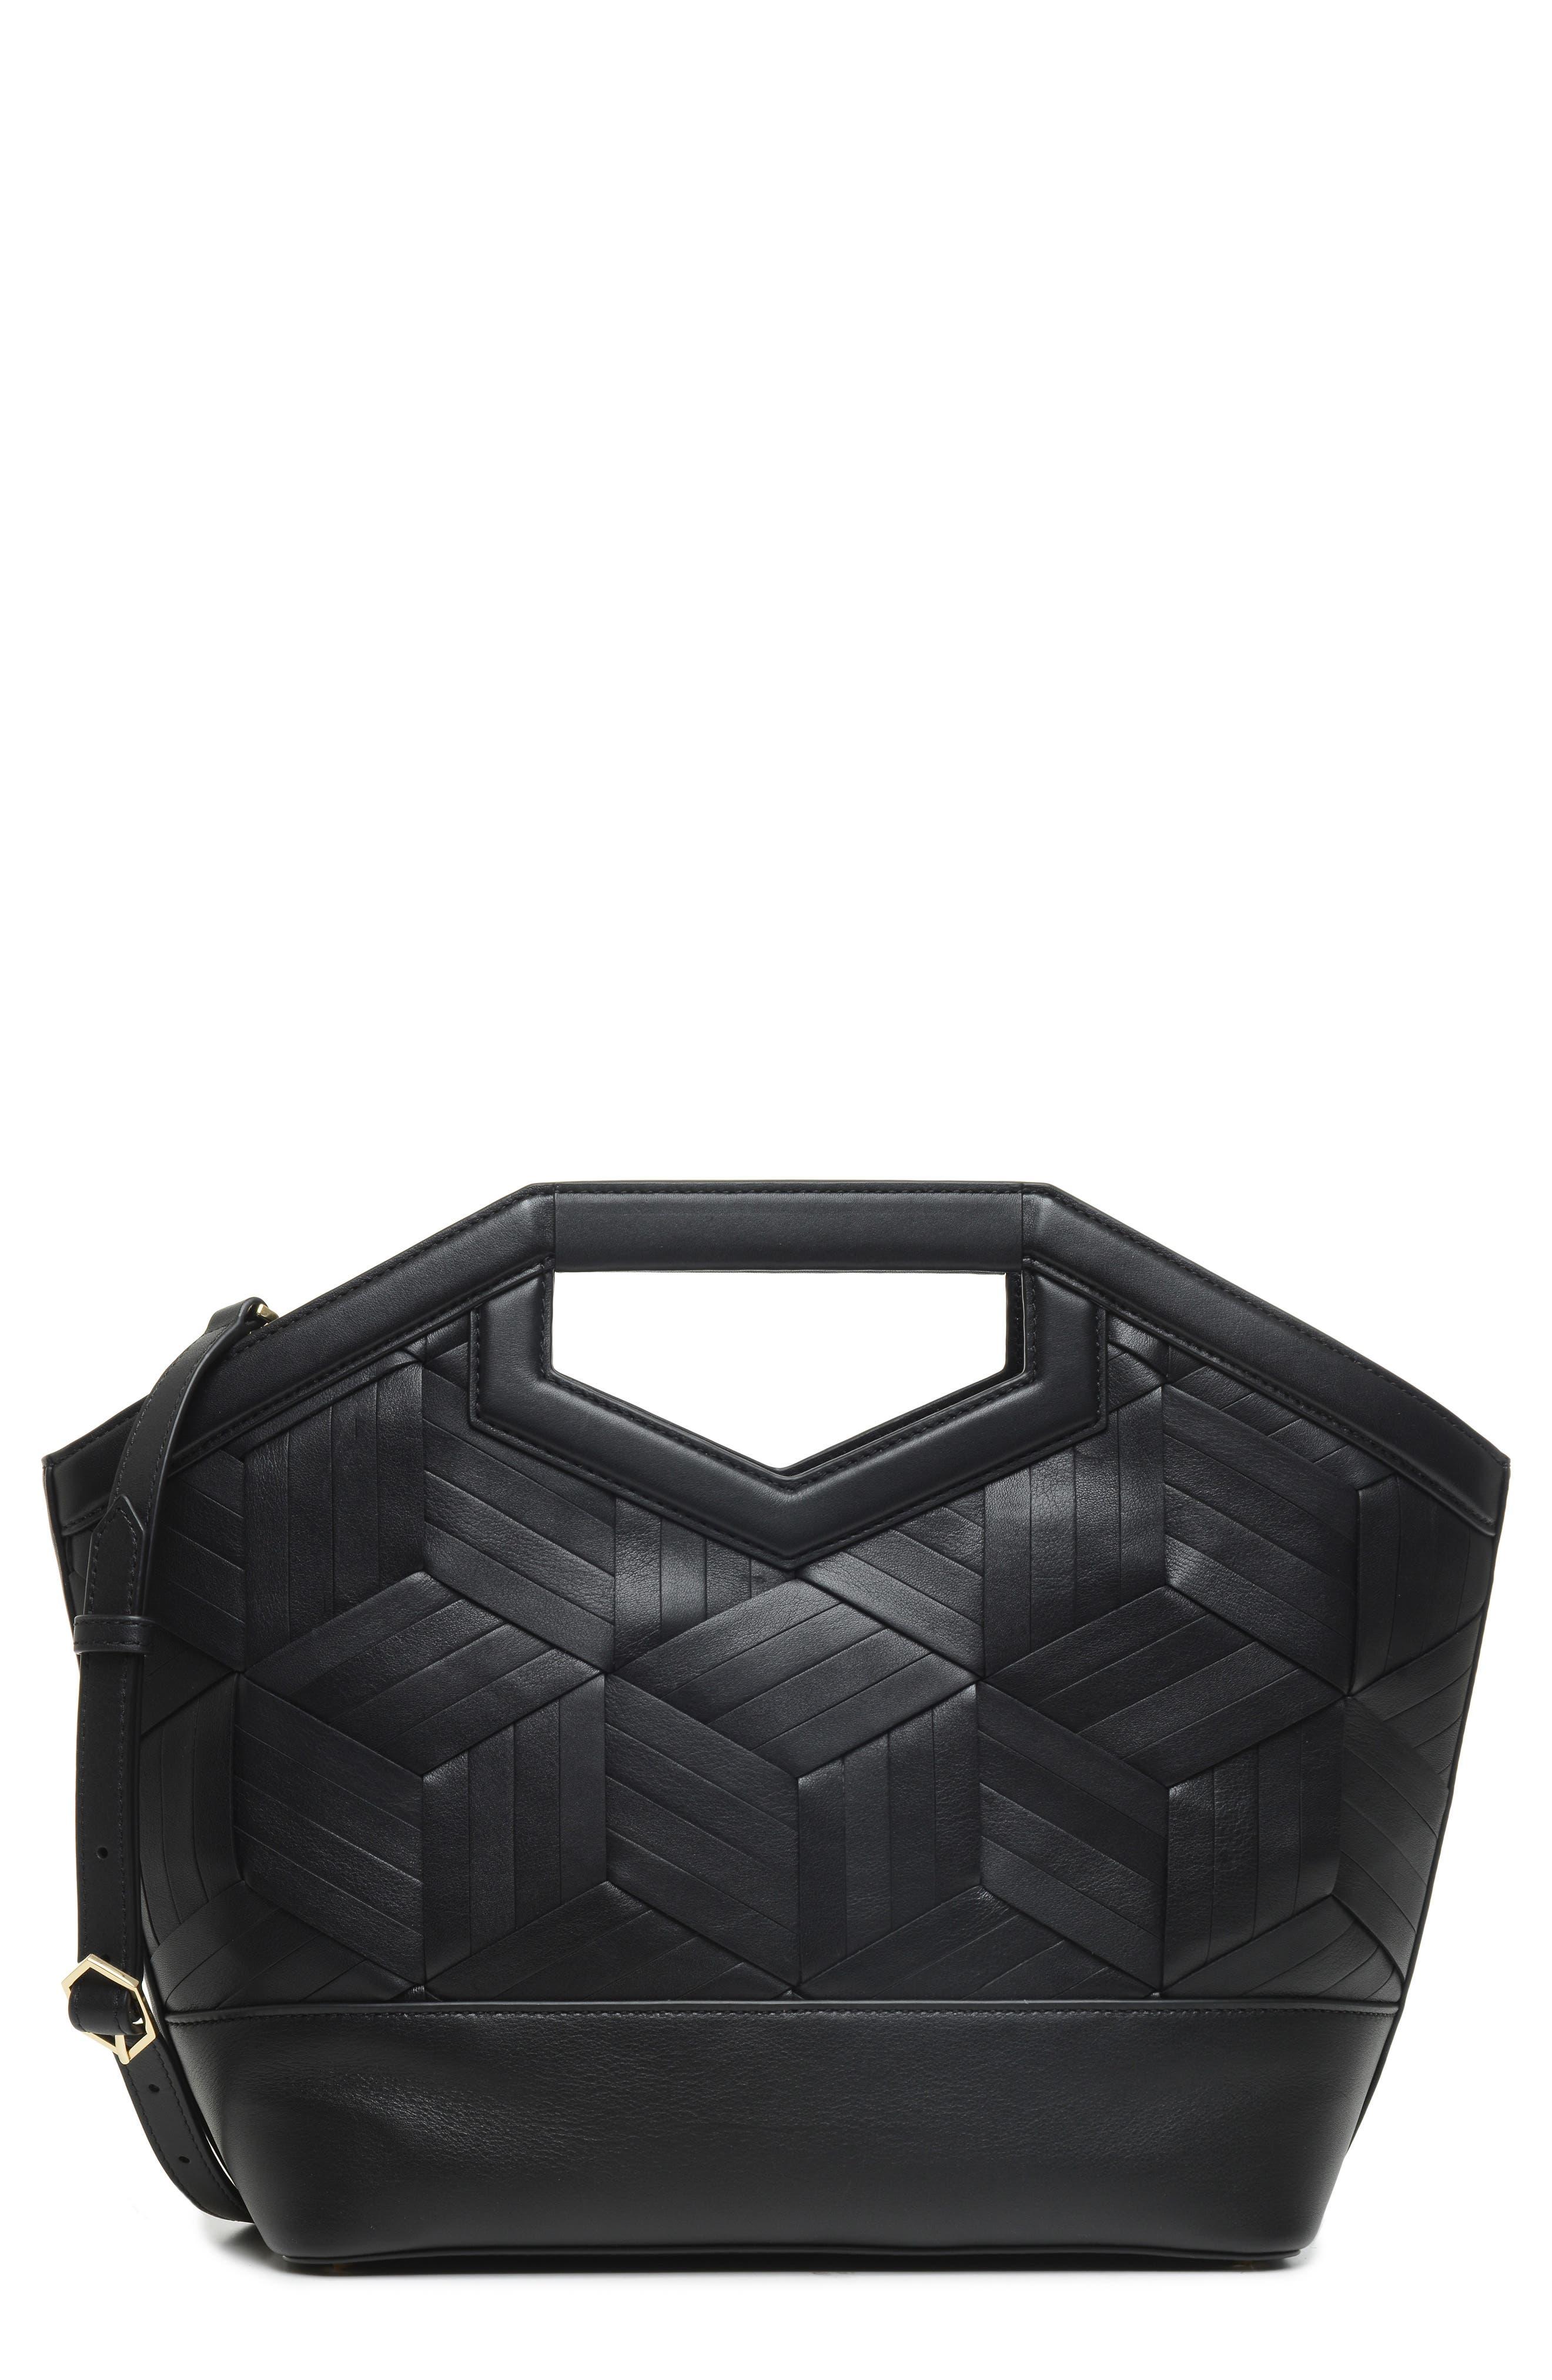 Sonder Leather Tote,                             Main thumbnail 1, color,                             BLACK